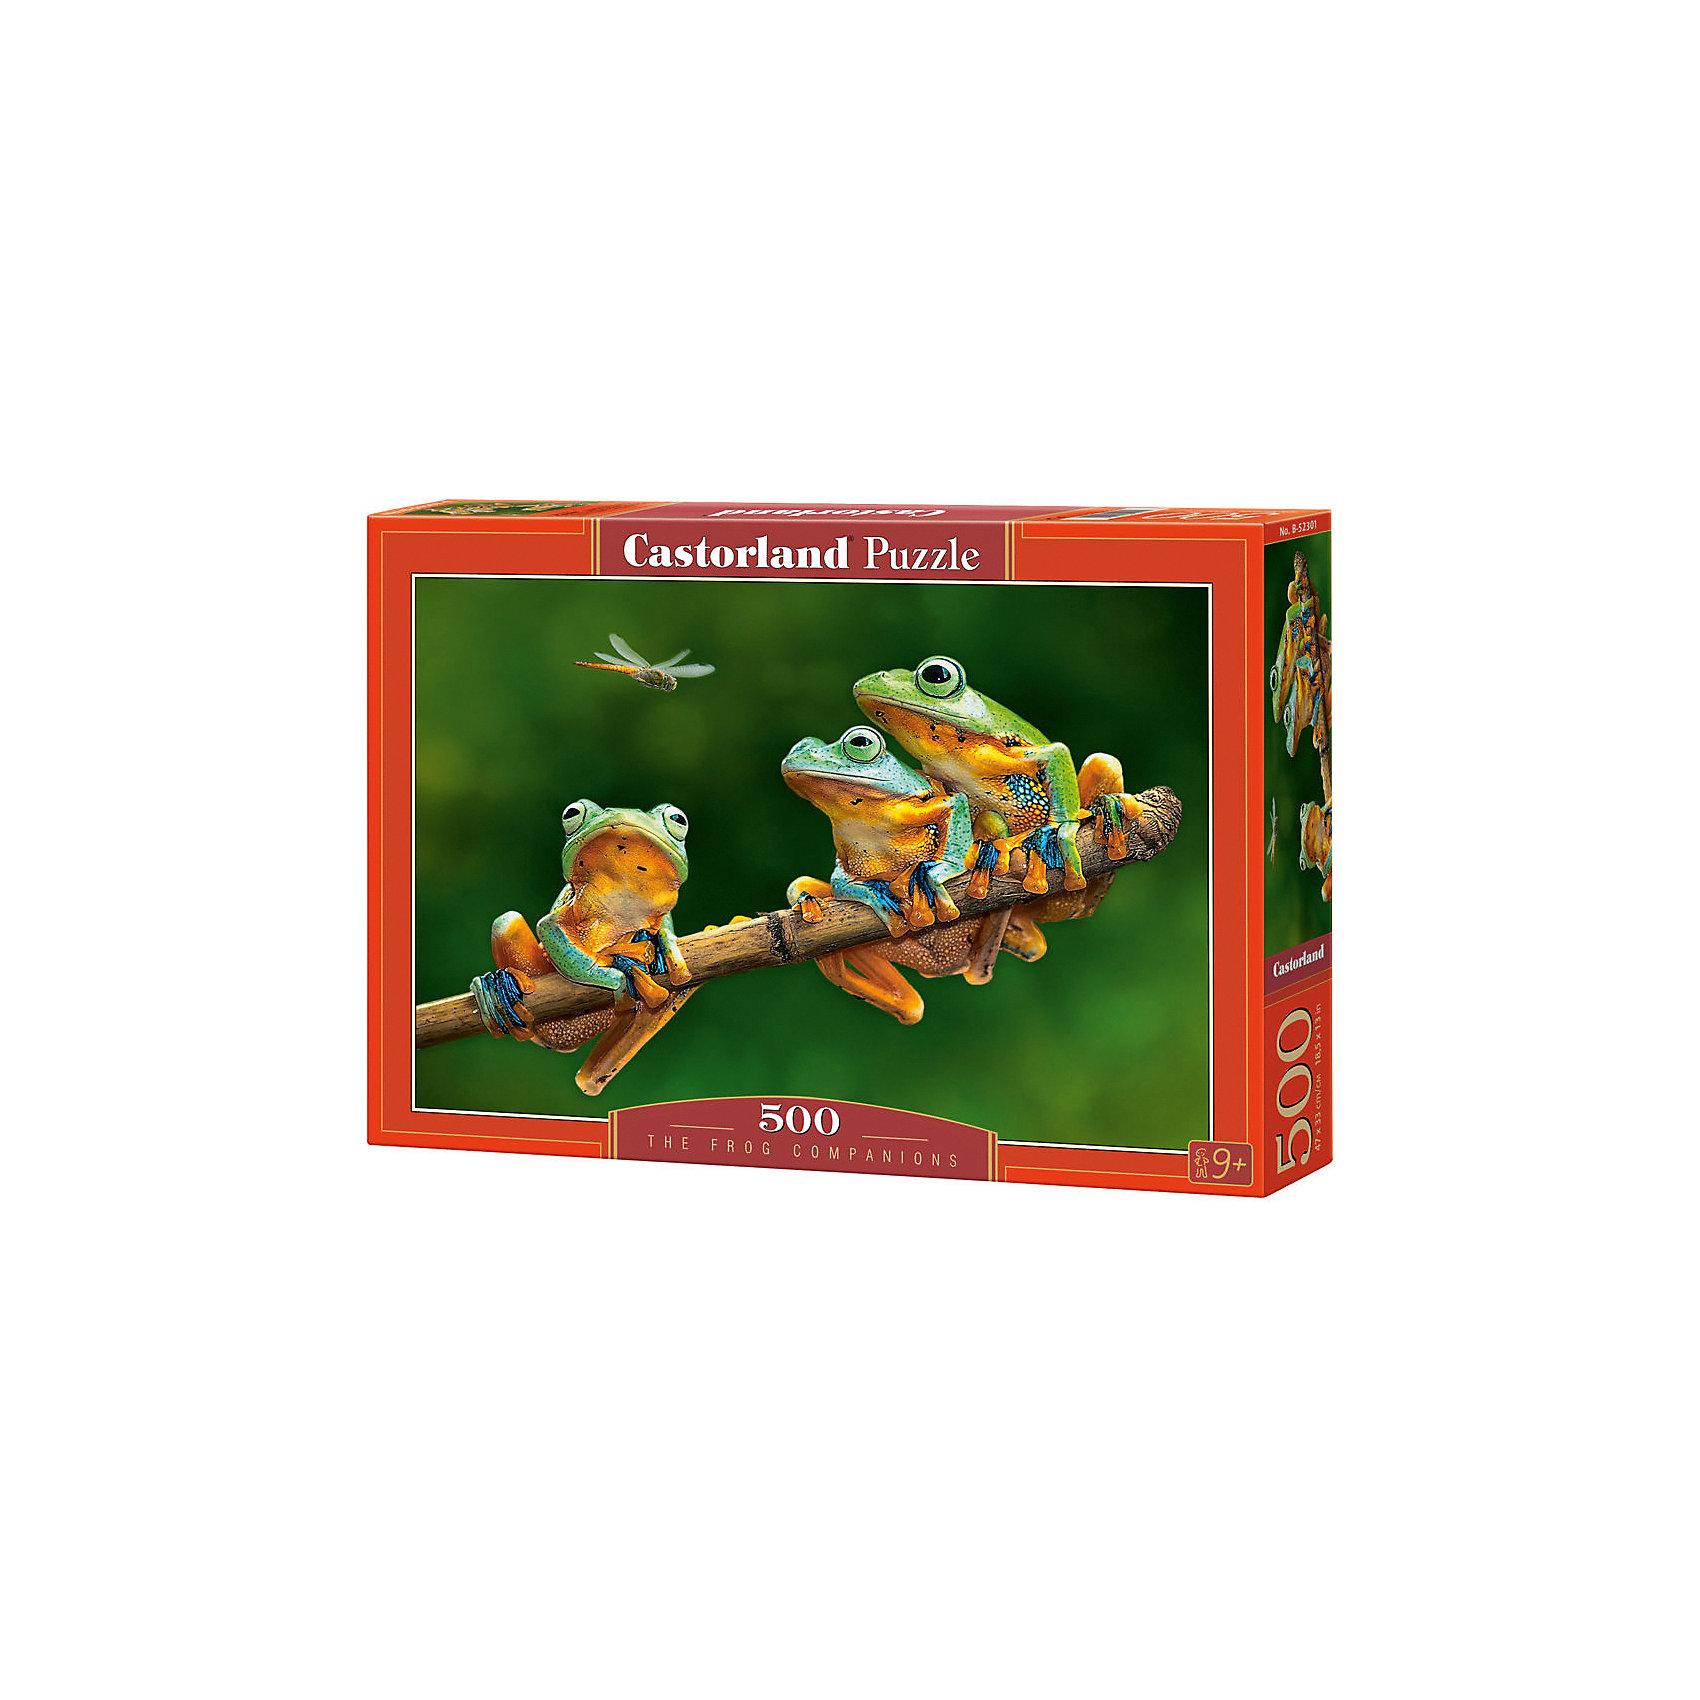 Castorland Пазл Лягушки, 500 деталей, Castorland castorland пазл красная шапочка castorland 20 деталей